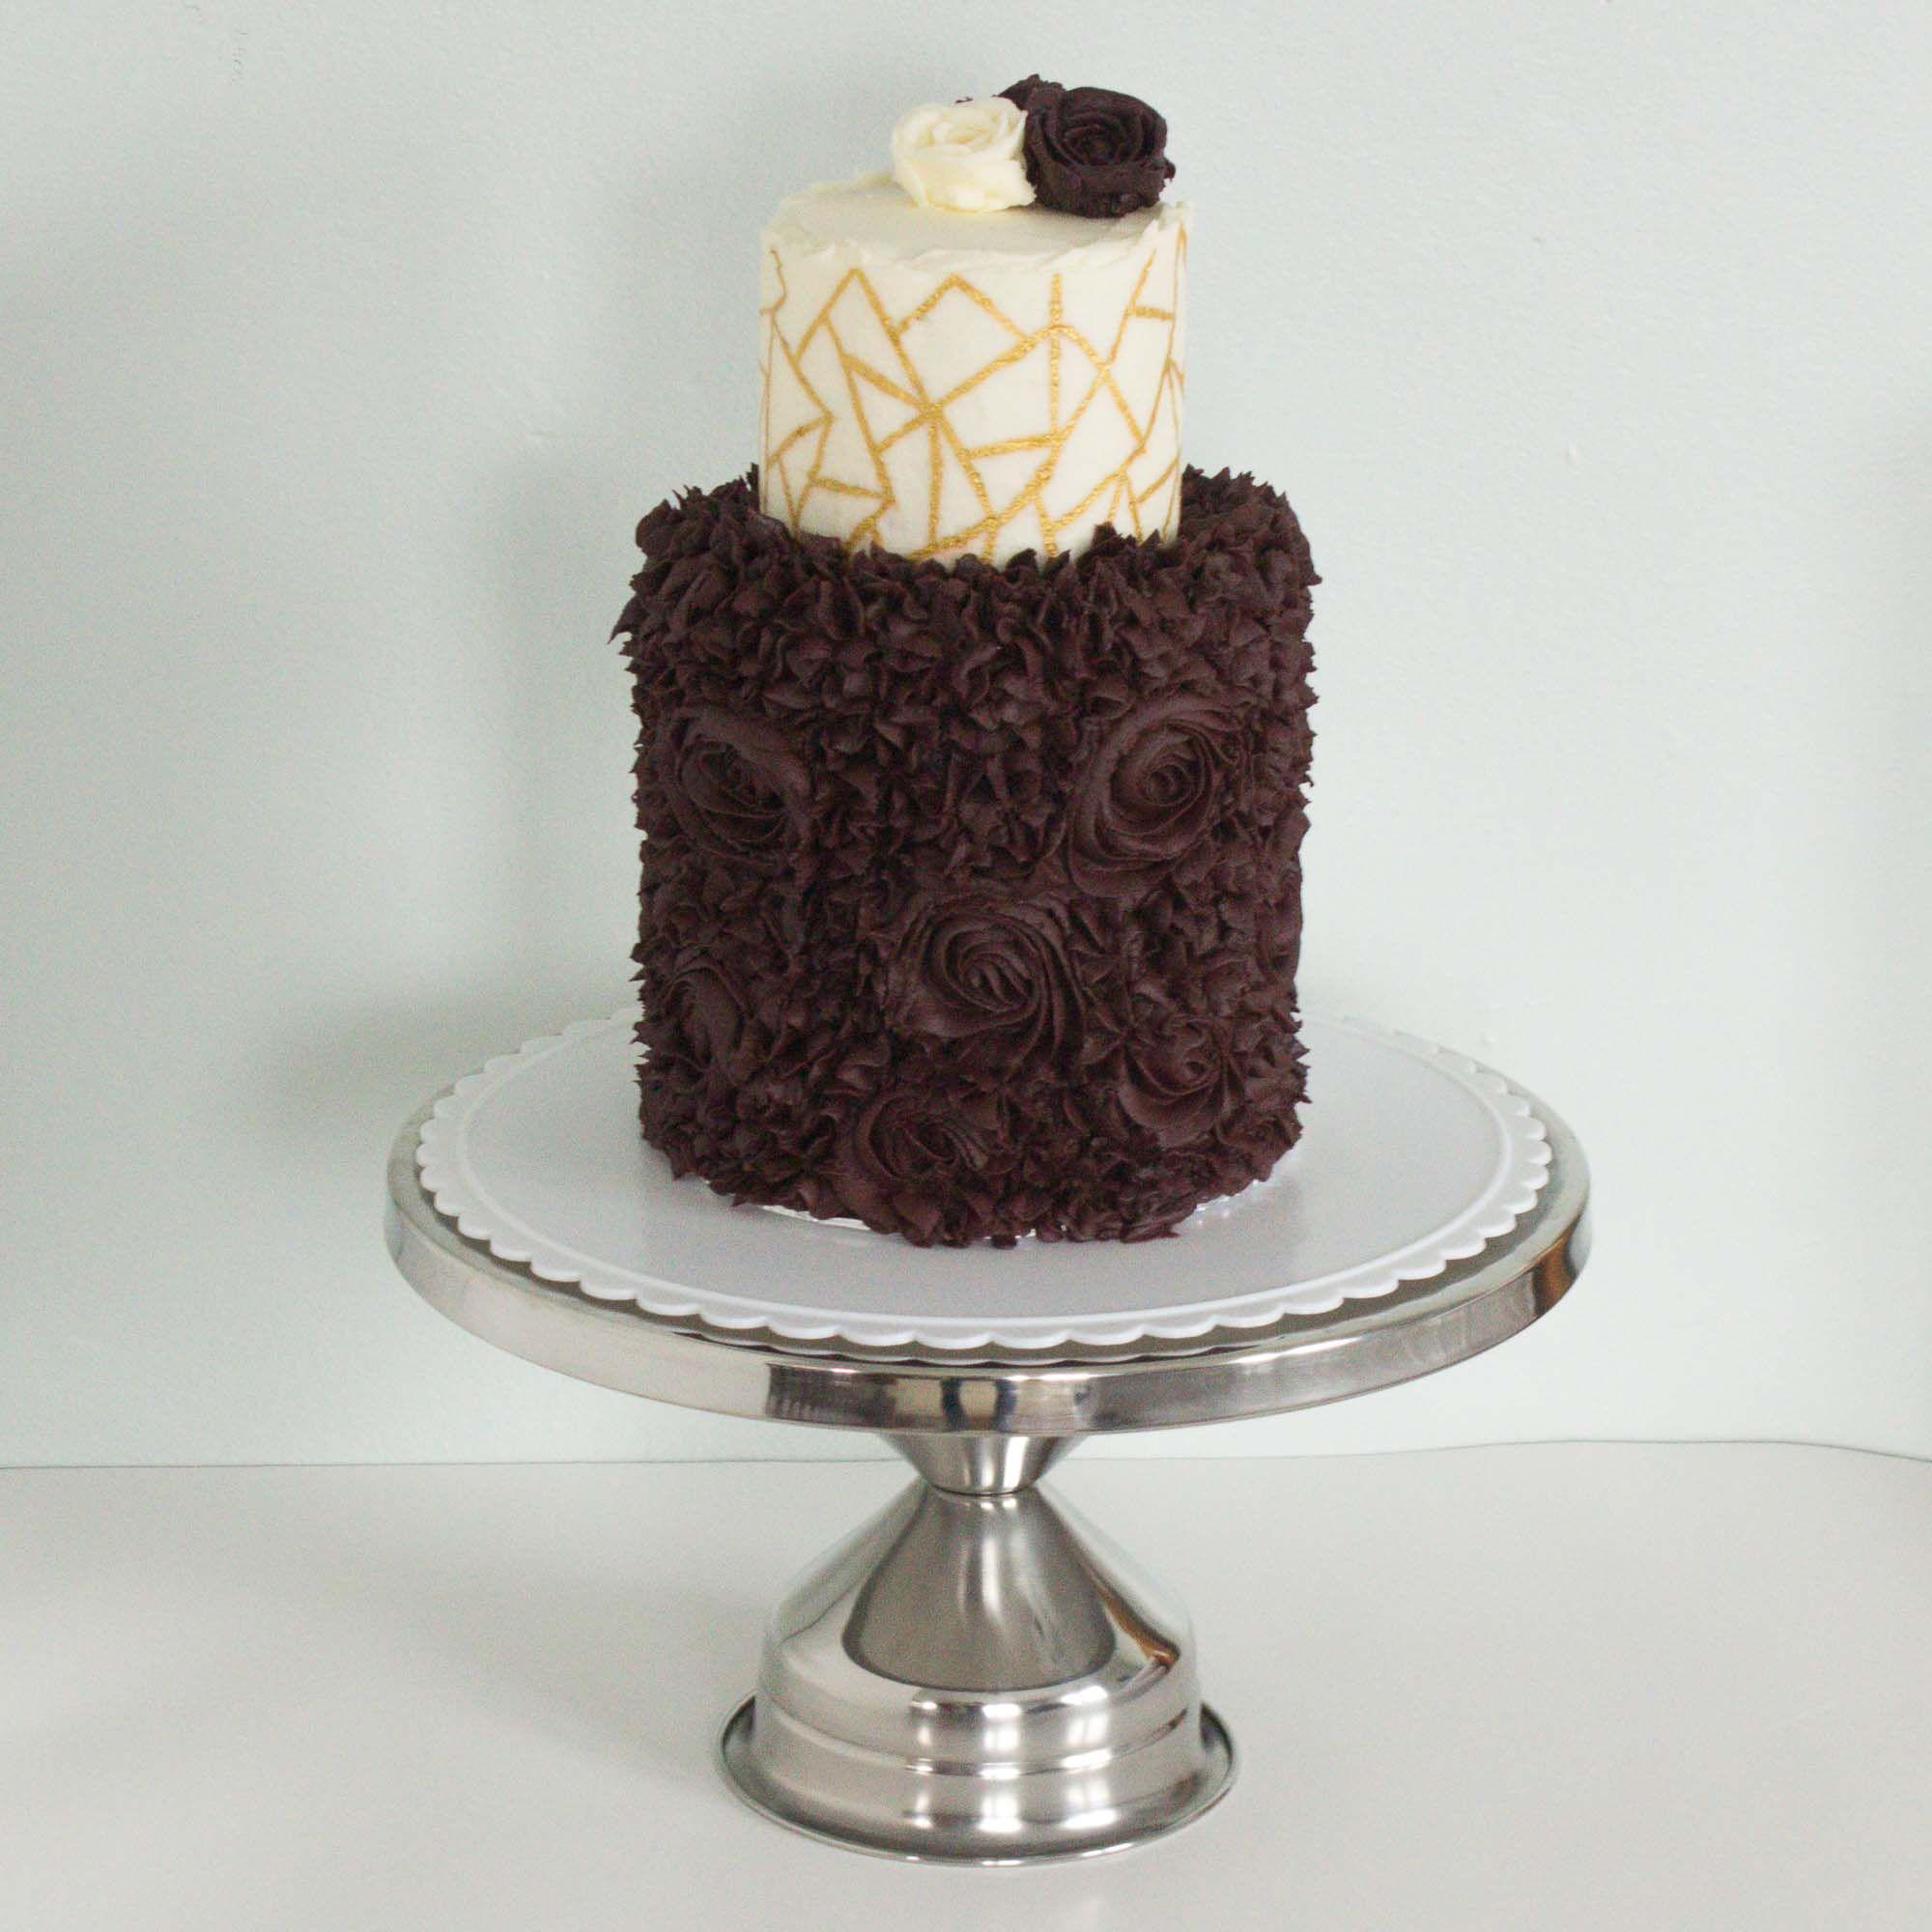 Burgundy wedding cake Burgundy wedding cake, Cake